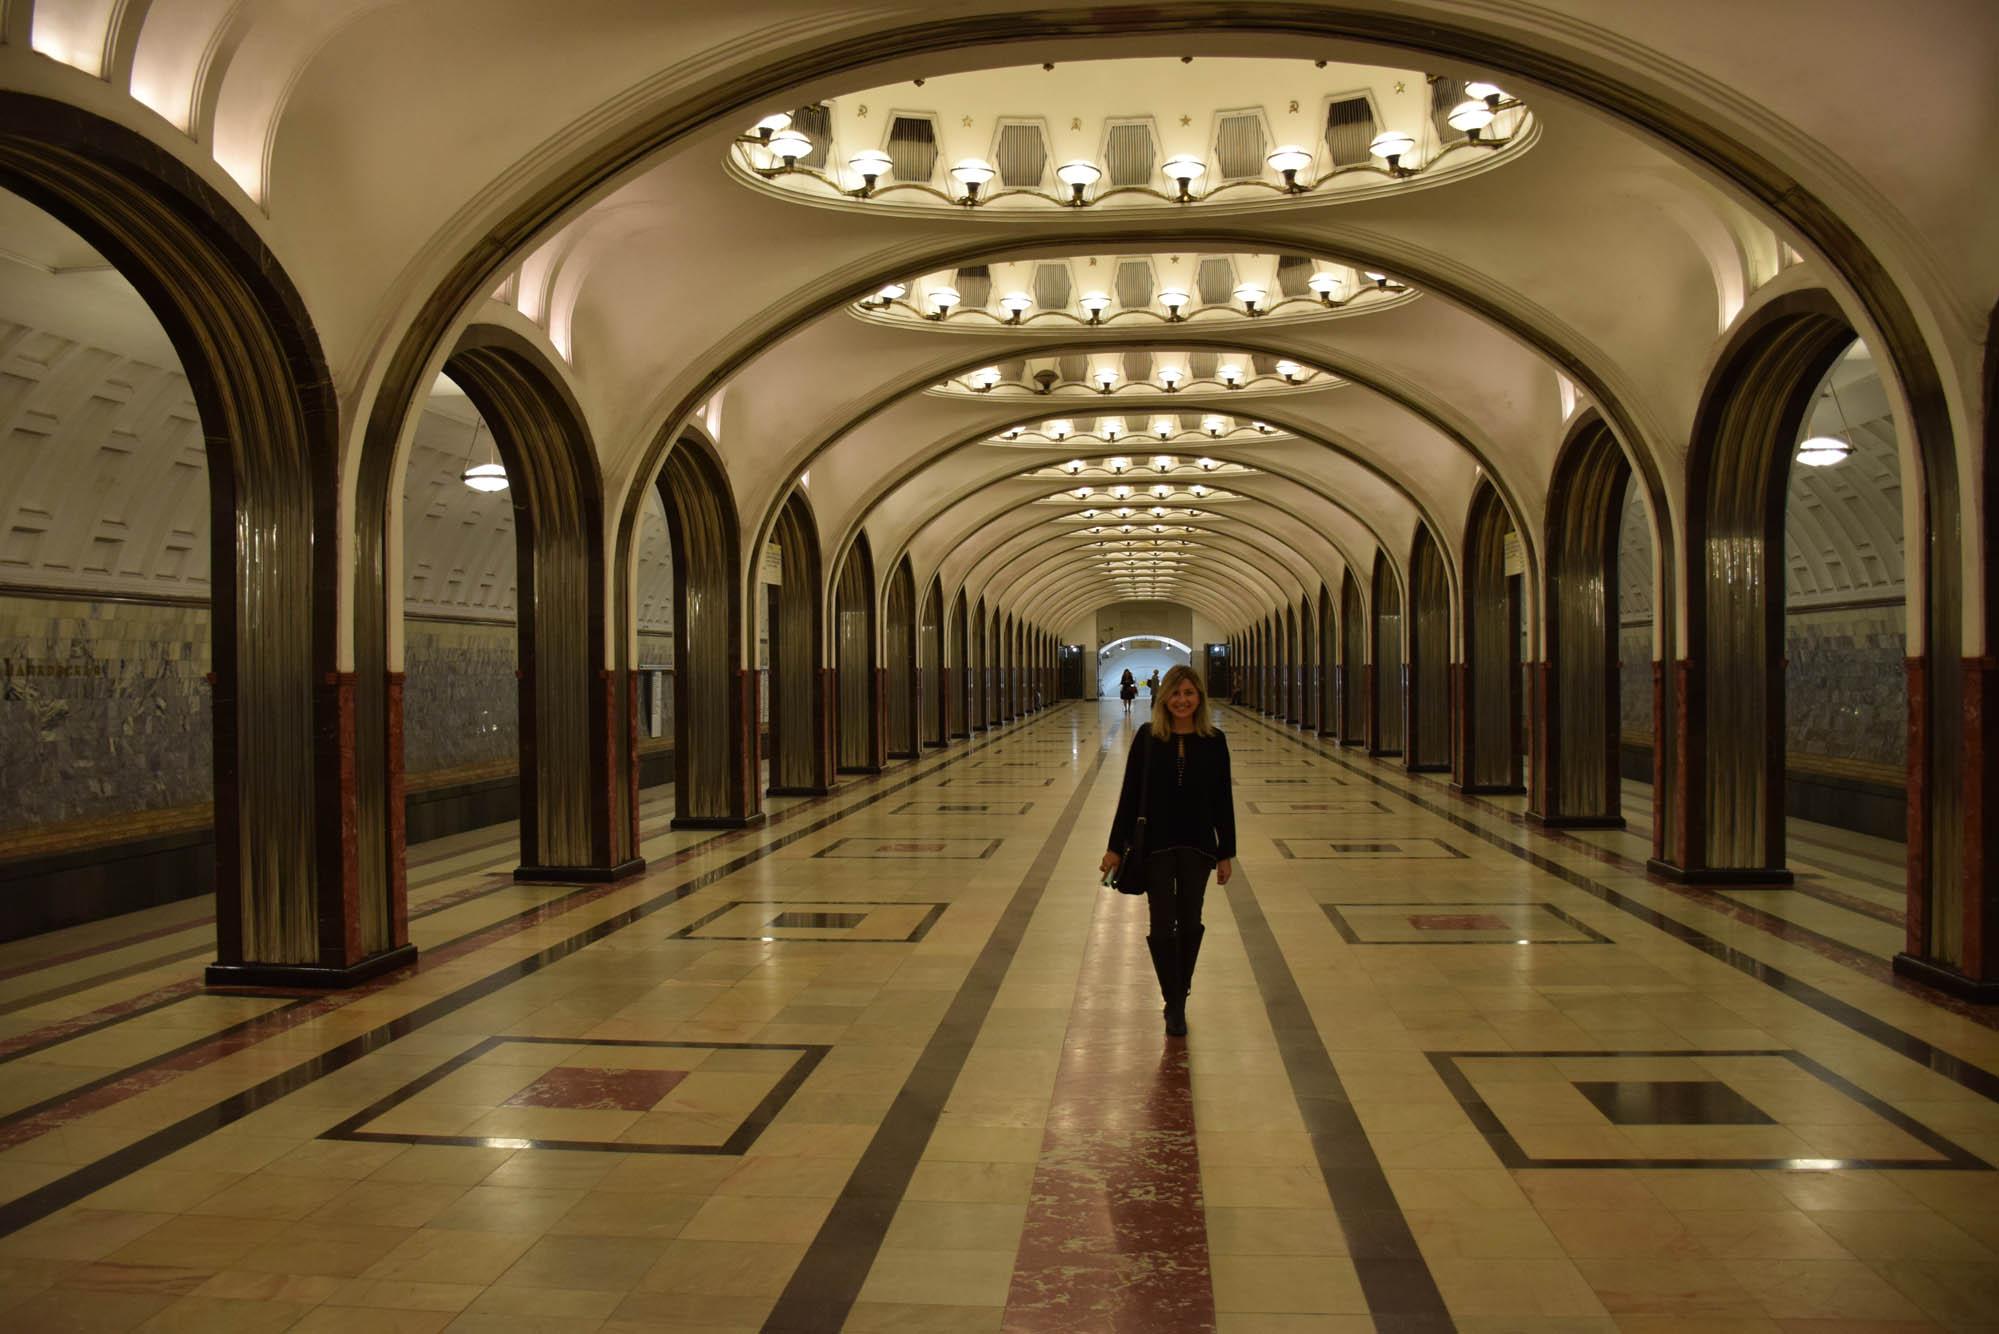 Estação de metrô Mayakovskaya Moscou